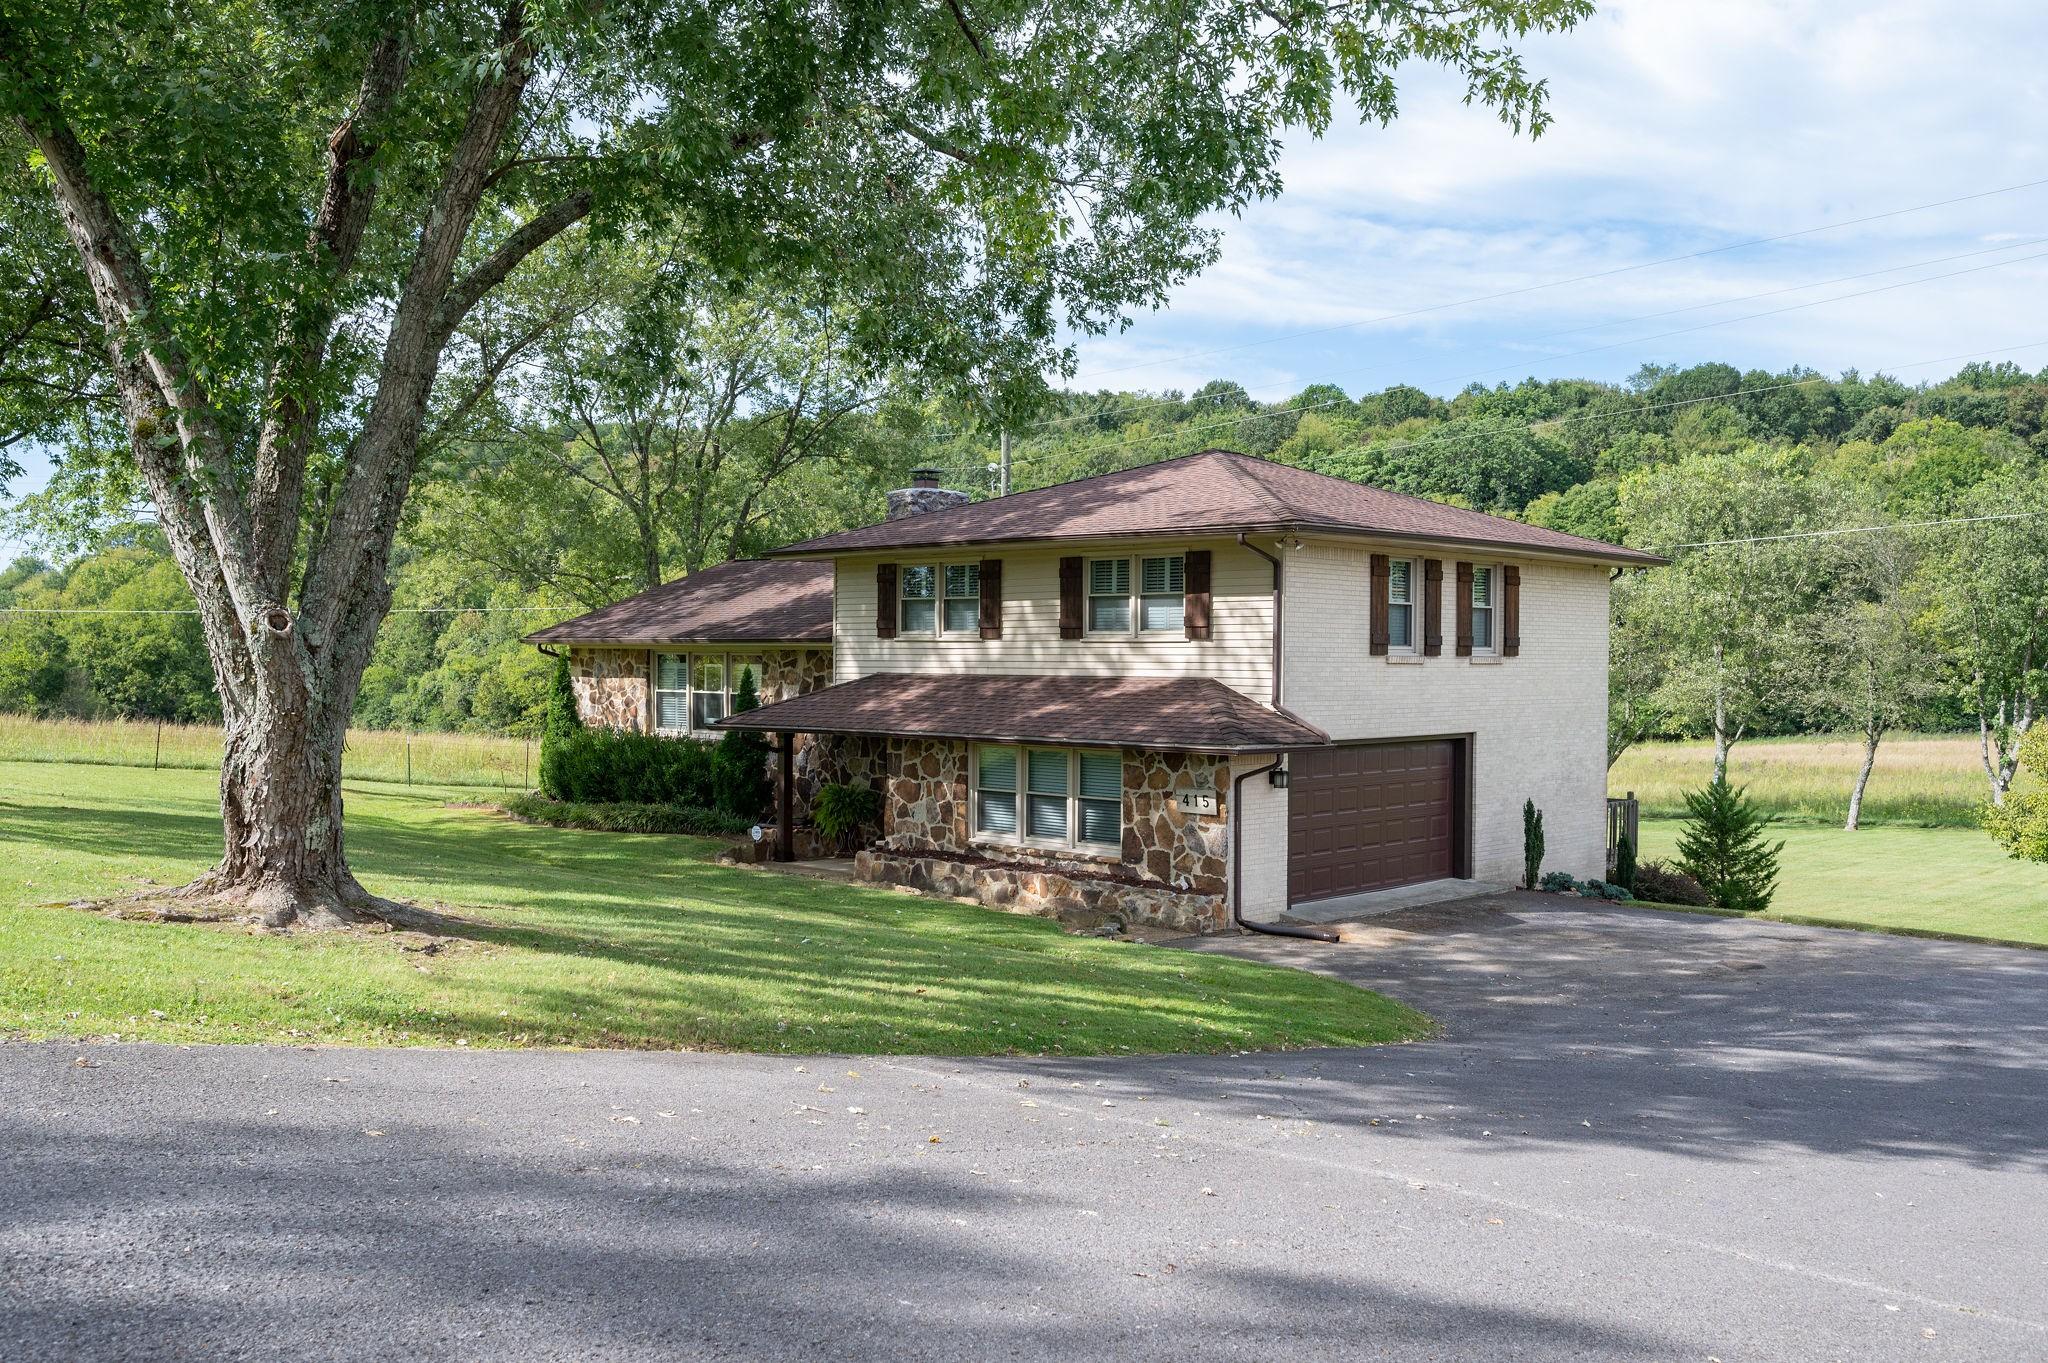 415 Doolittle Rd Property Photo - Woodbury, TN real estate listing